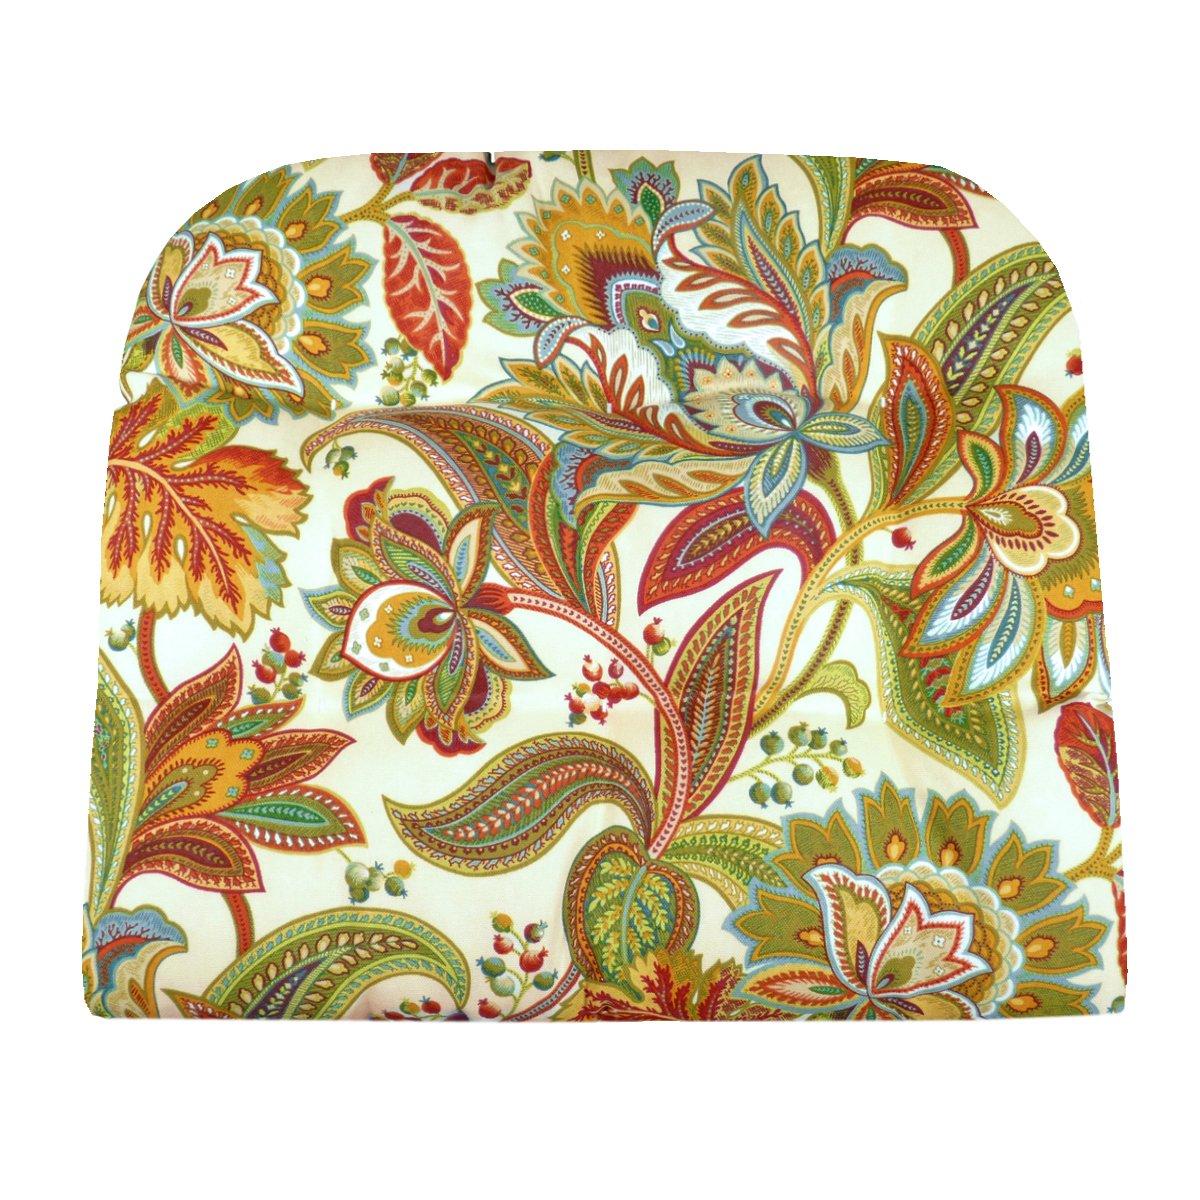 Patio Chair Cushion - Valbella Fiesta Multi - Indoor / Outdoor: Mildew Resistant, Fade Resistant - Latex Foam Fill, Reversible (Adirondack, Wicker)